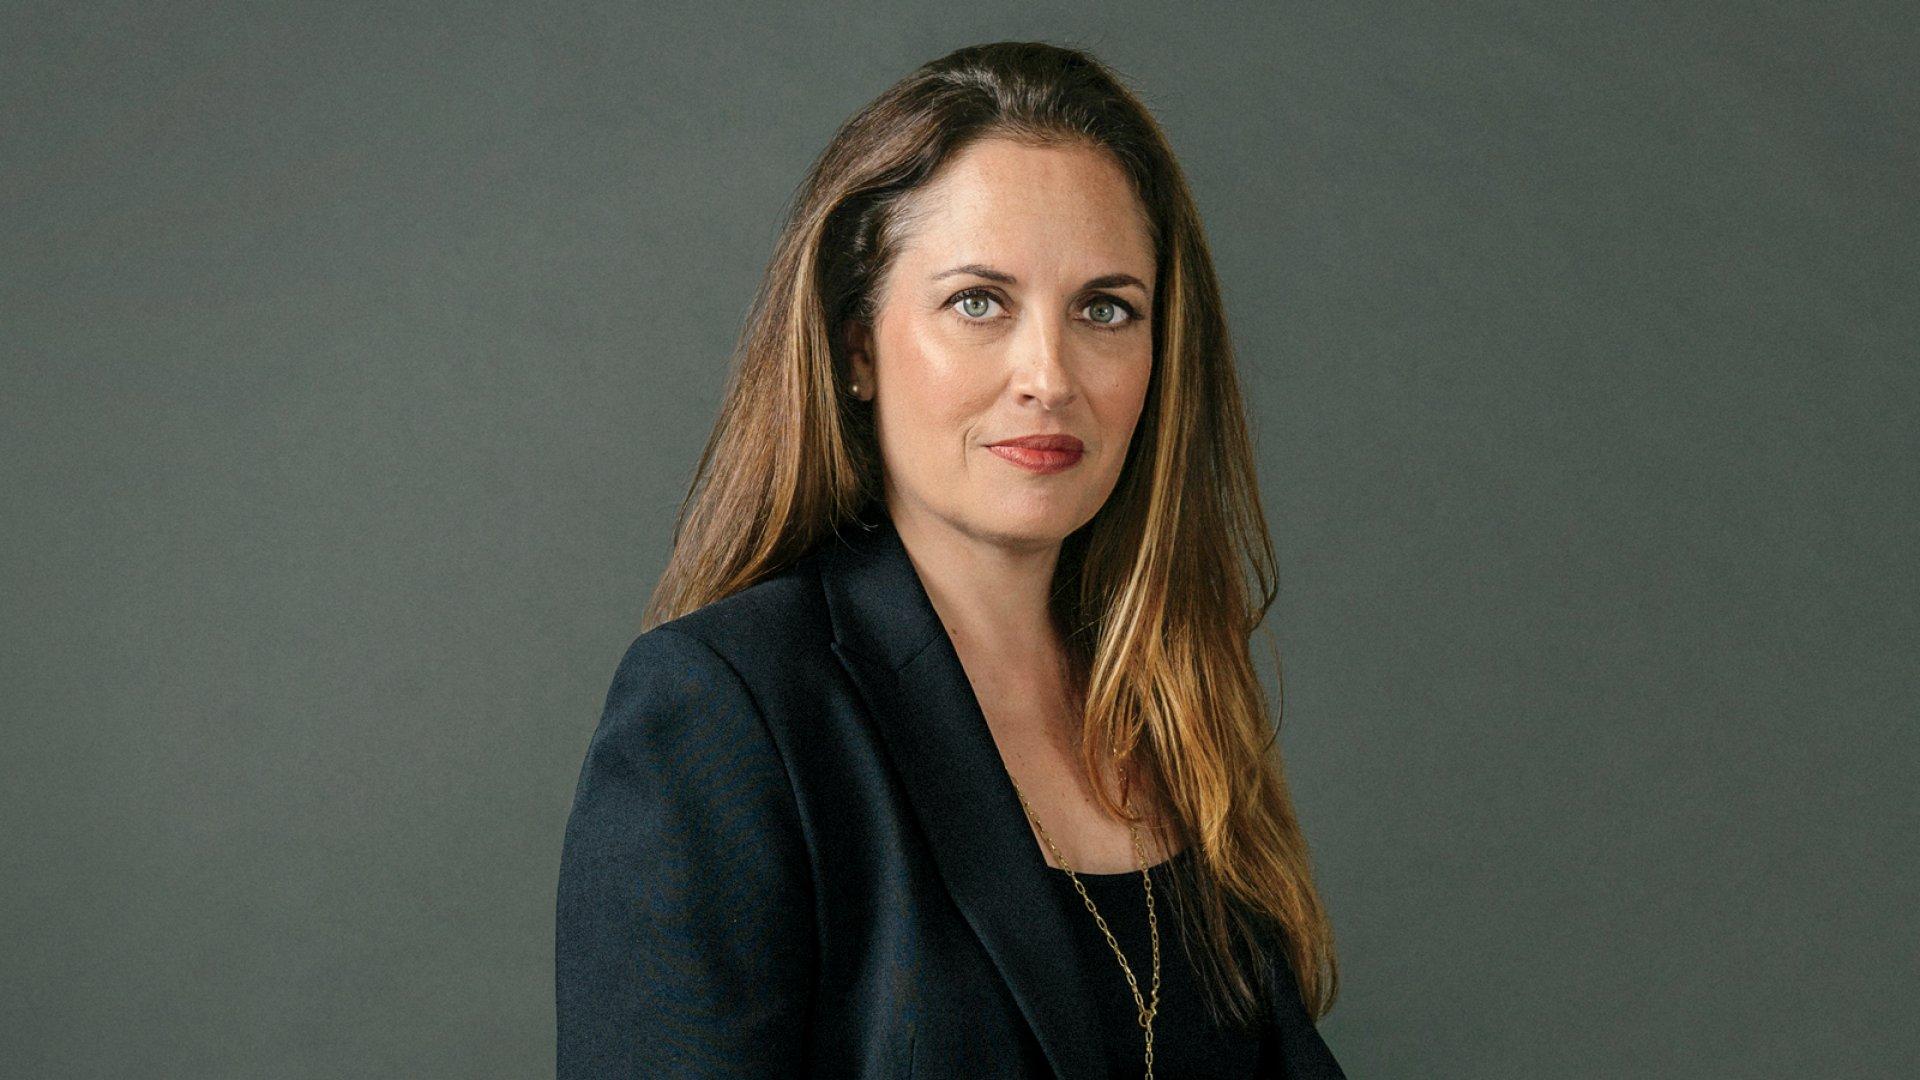 Ingrid Saden, co-founder of Boolean Girl Tech.